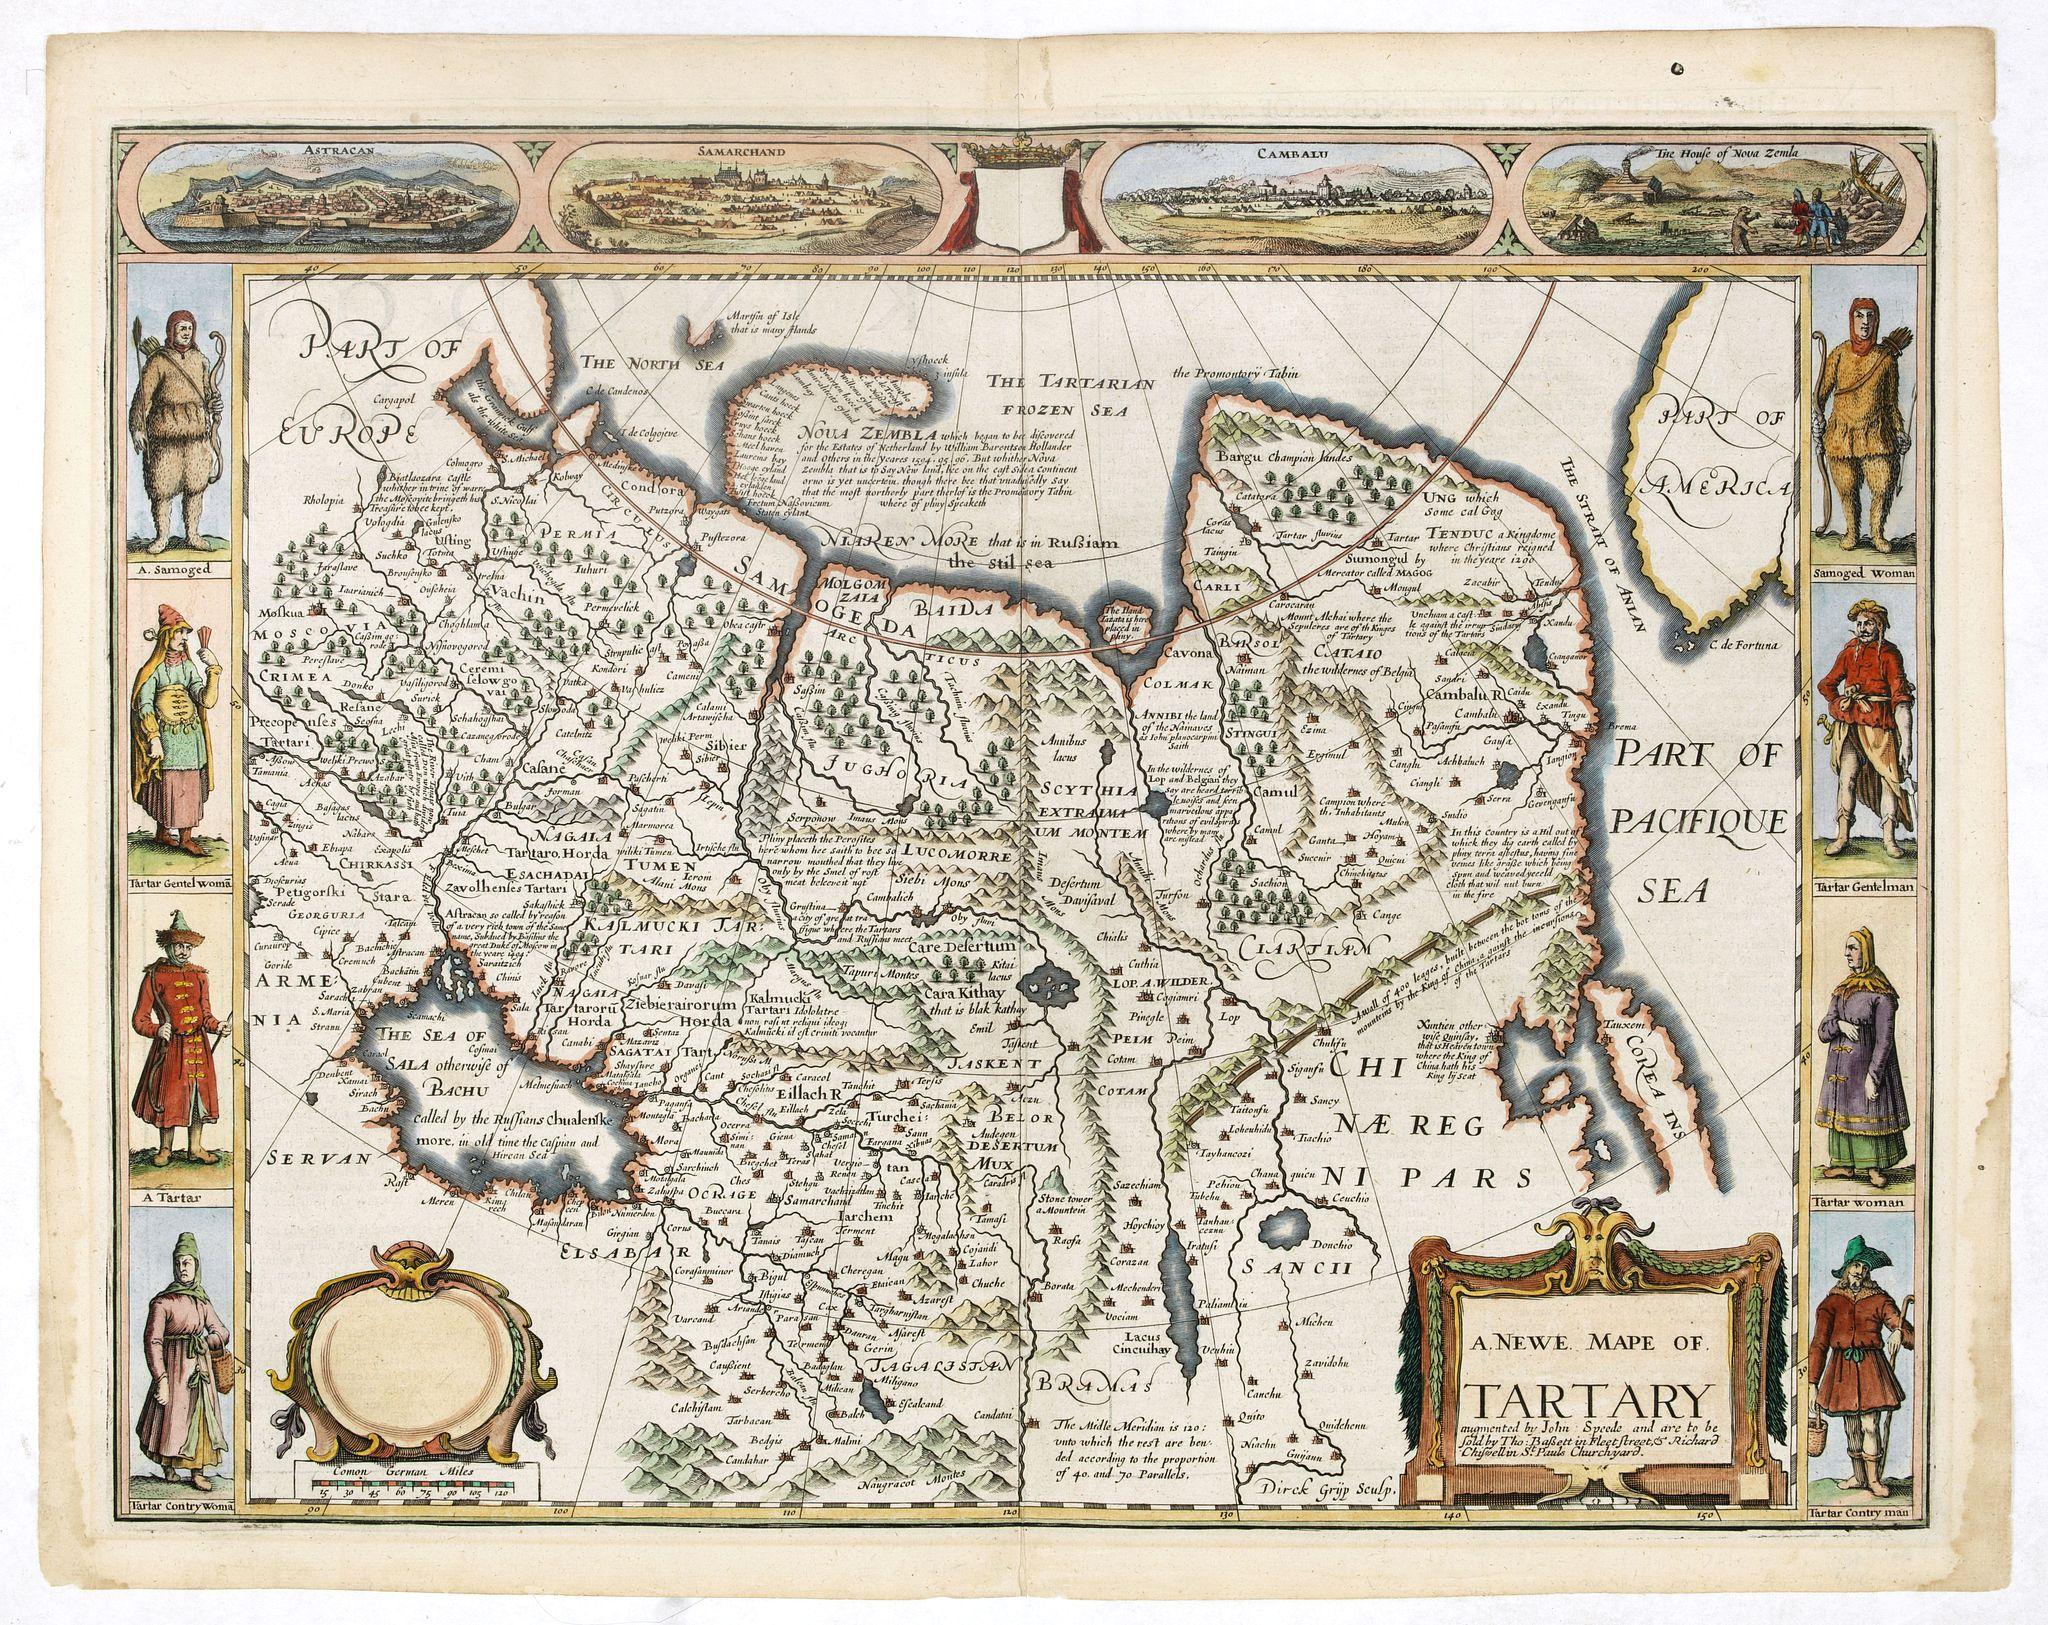 SPEED, J. / BASSETT, J. -  A newe mape of Tartary.